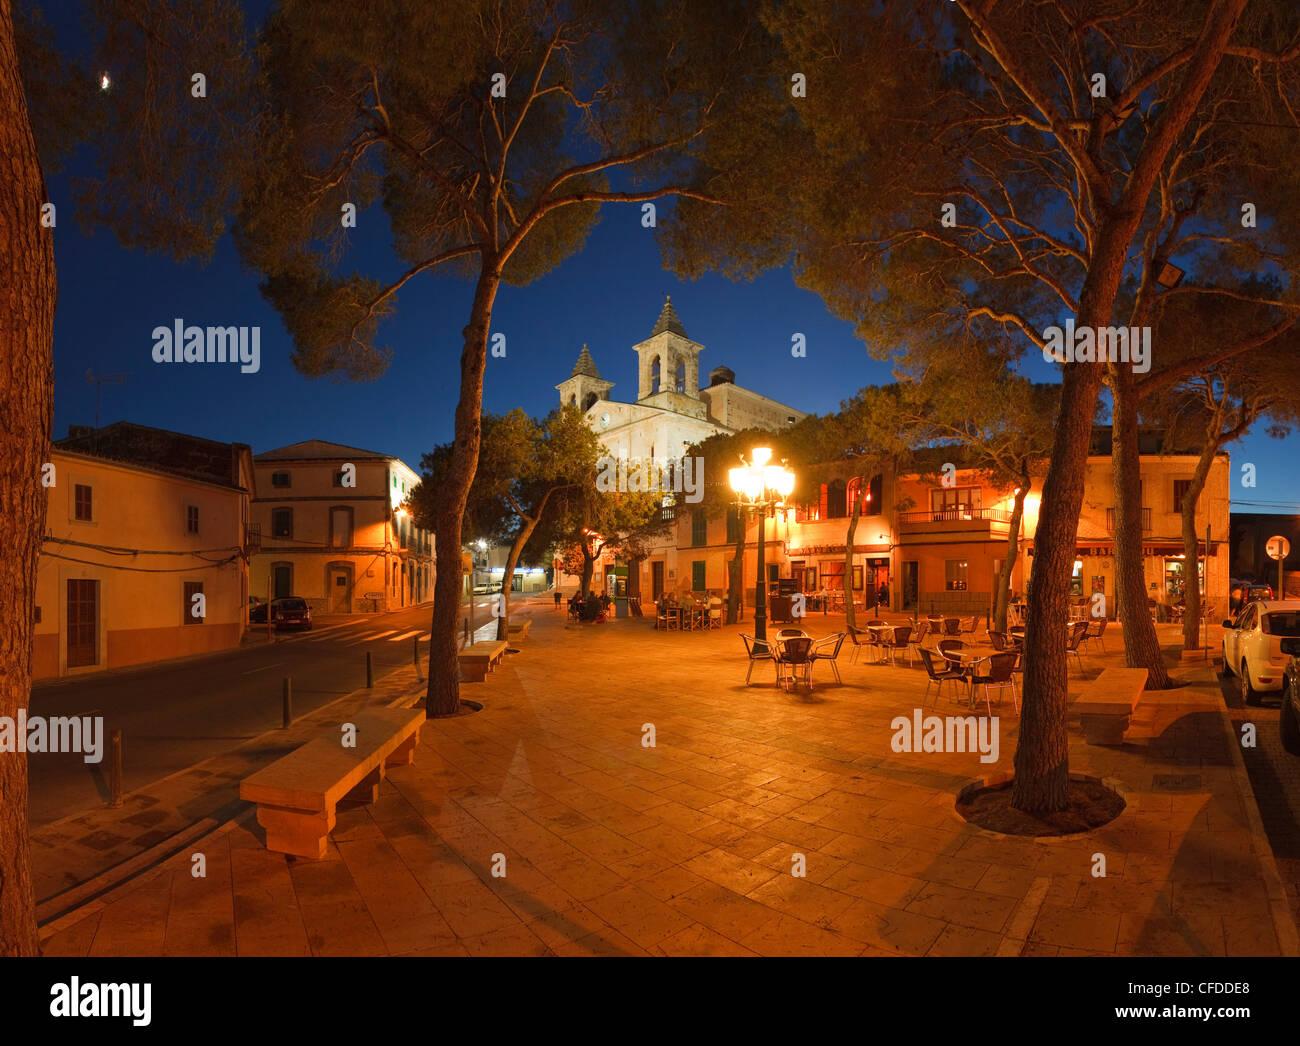 Placa San Jose, carré, S Alqueria Blanca, Majorque, Iles Baléares, Espagne, Europe Photo Stock